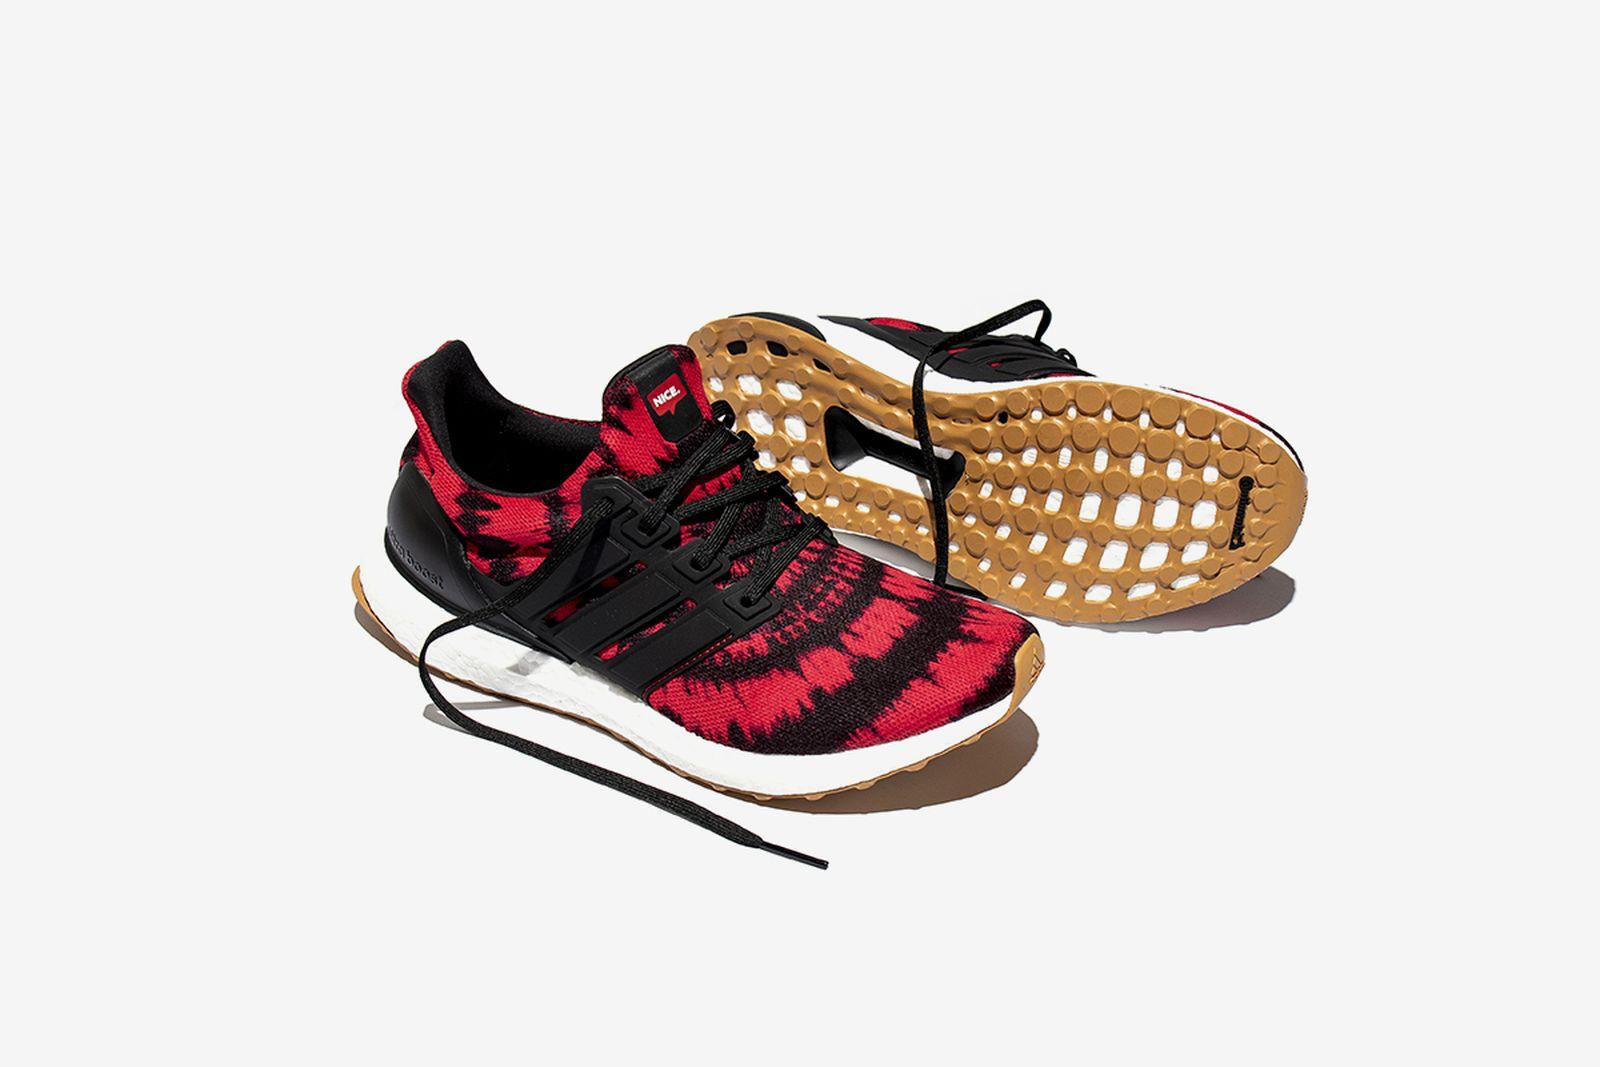 nice-kicks-adidas-ultraboost-no-vacancy-release-date-price-1-03